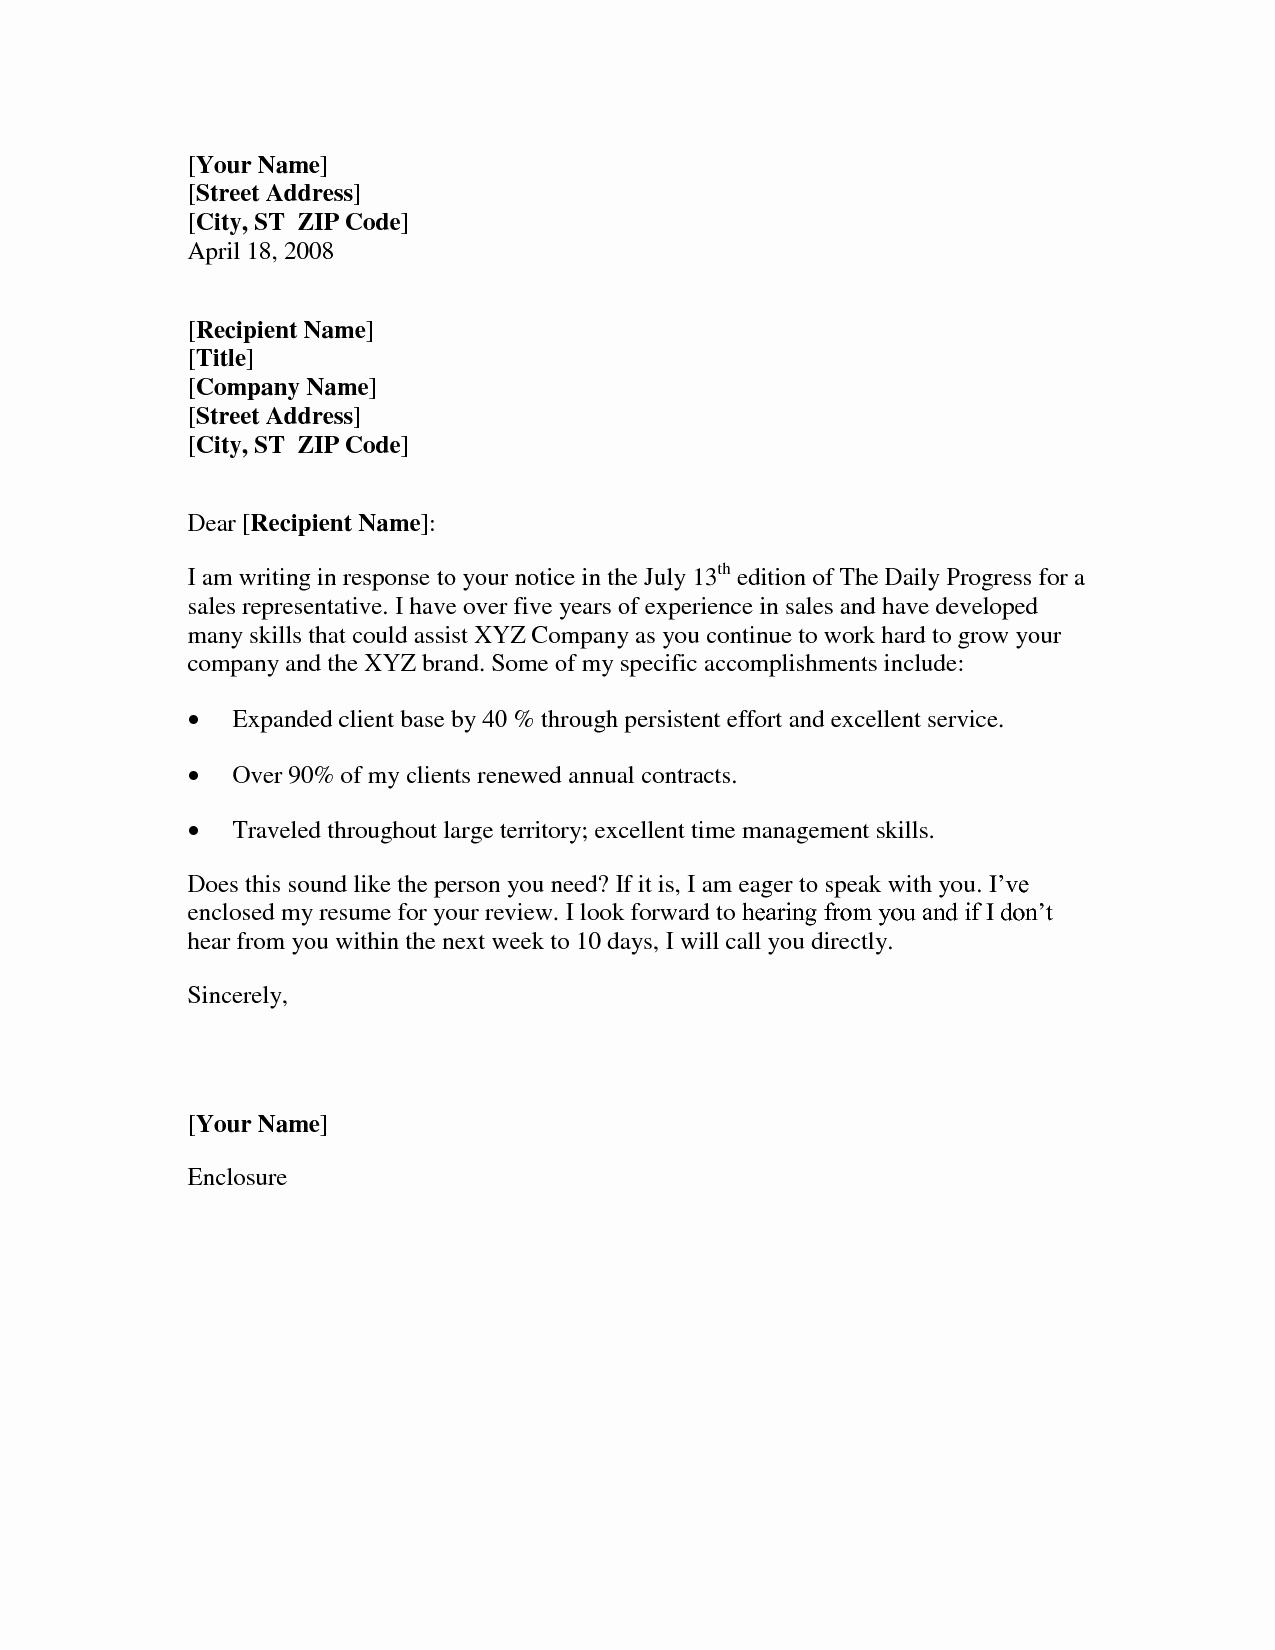 Simple Resume Cover Letter Examples Inspirational 10 Best Of Basic Cover Letter for Resume Sample